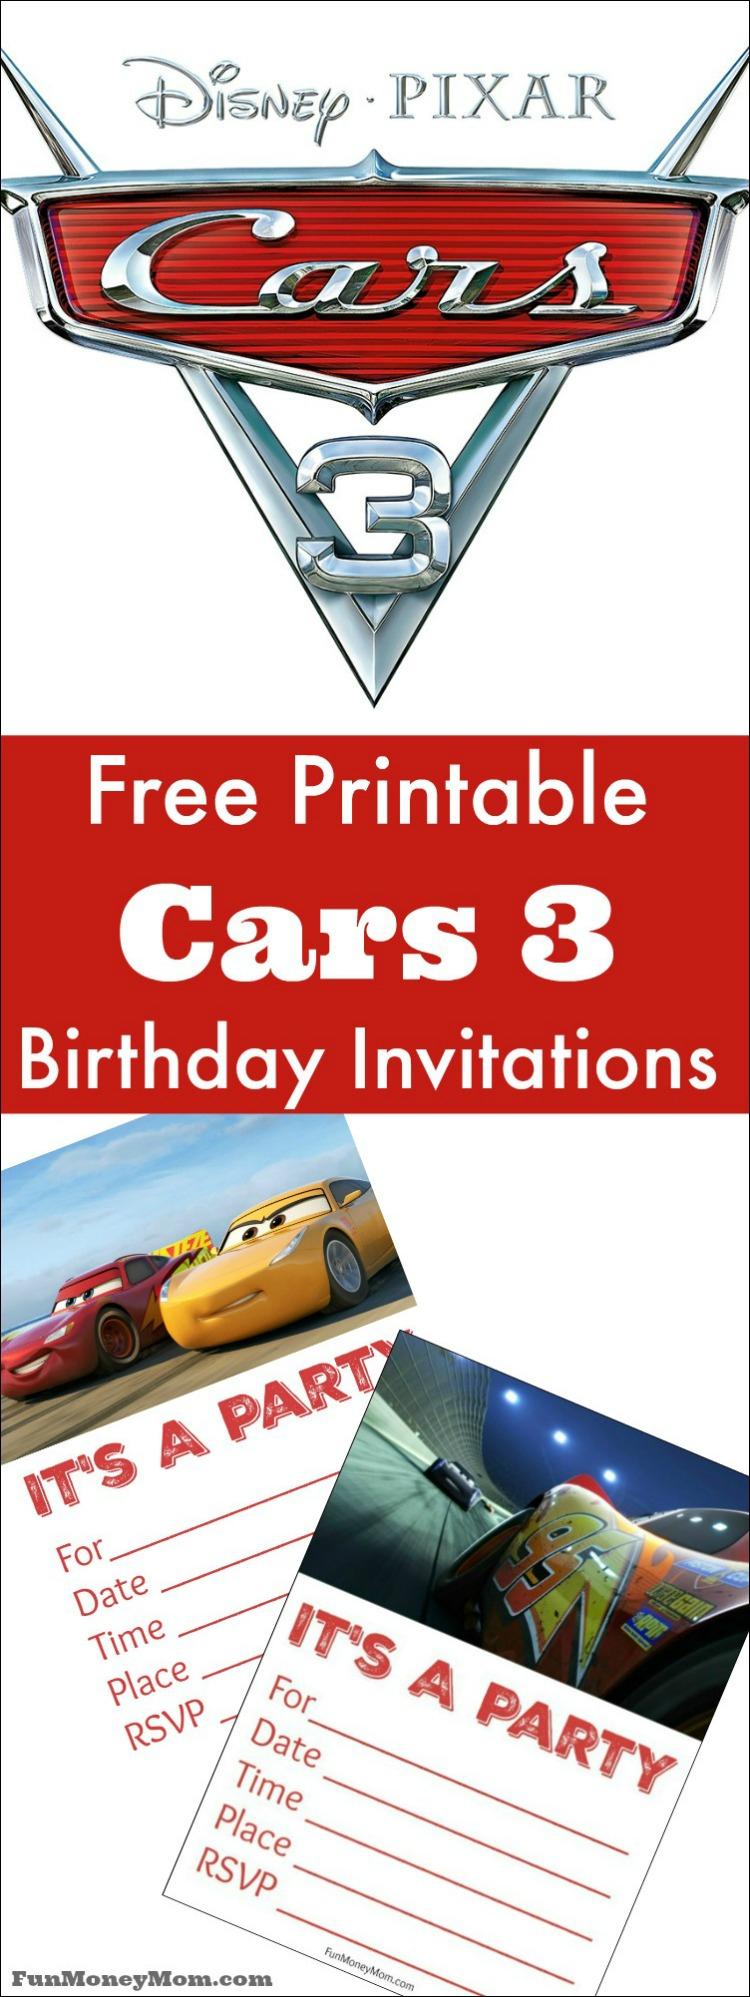 Free Printable Cars Birthday Invitations - Fun Money Mom - Free Printable Disney Cars Birthday Party Invitations